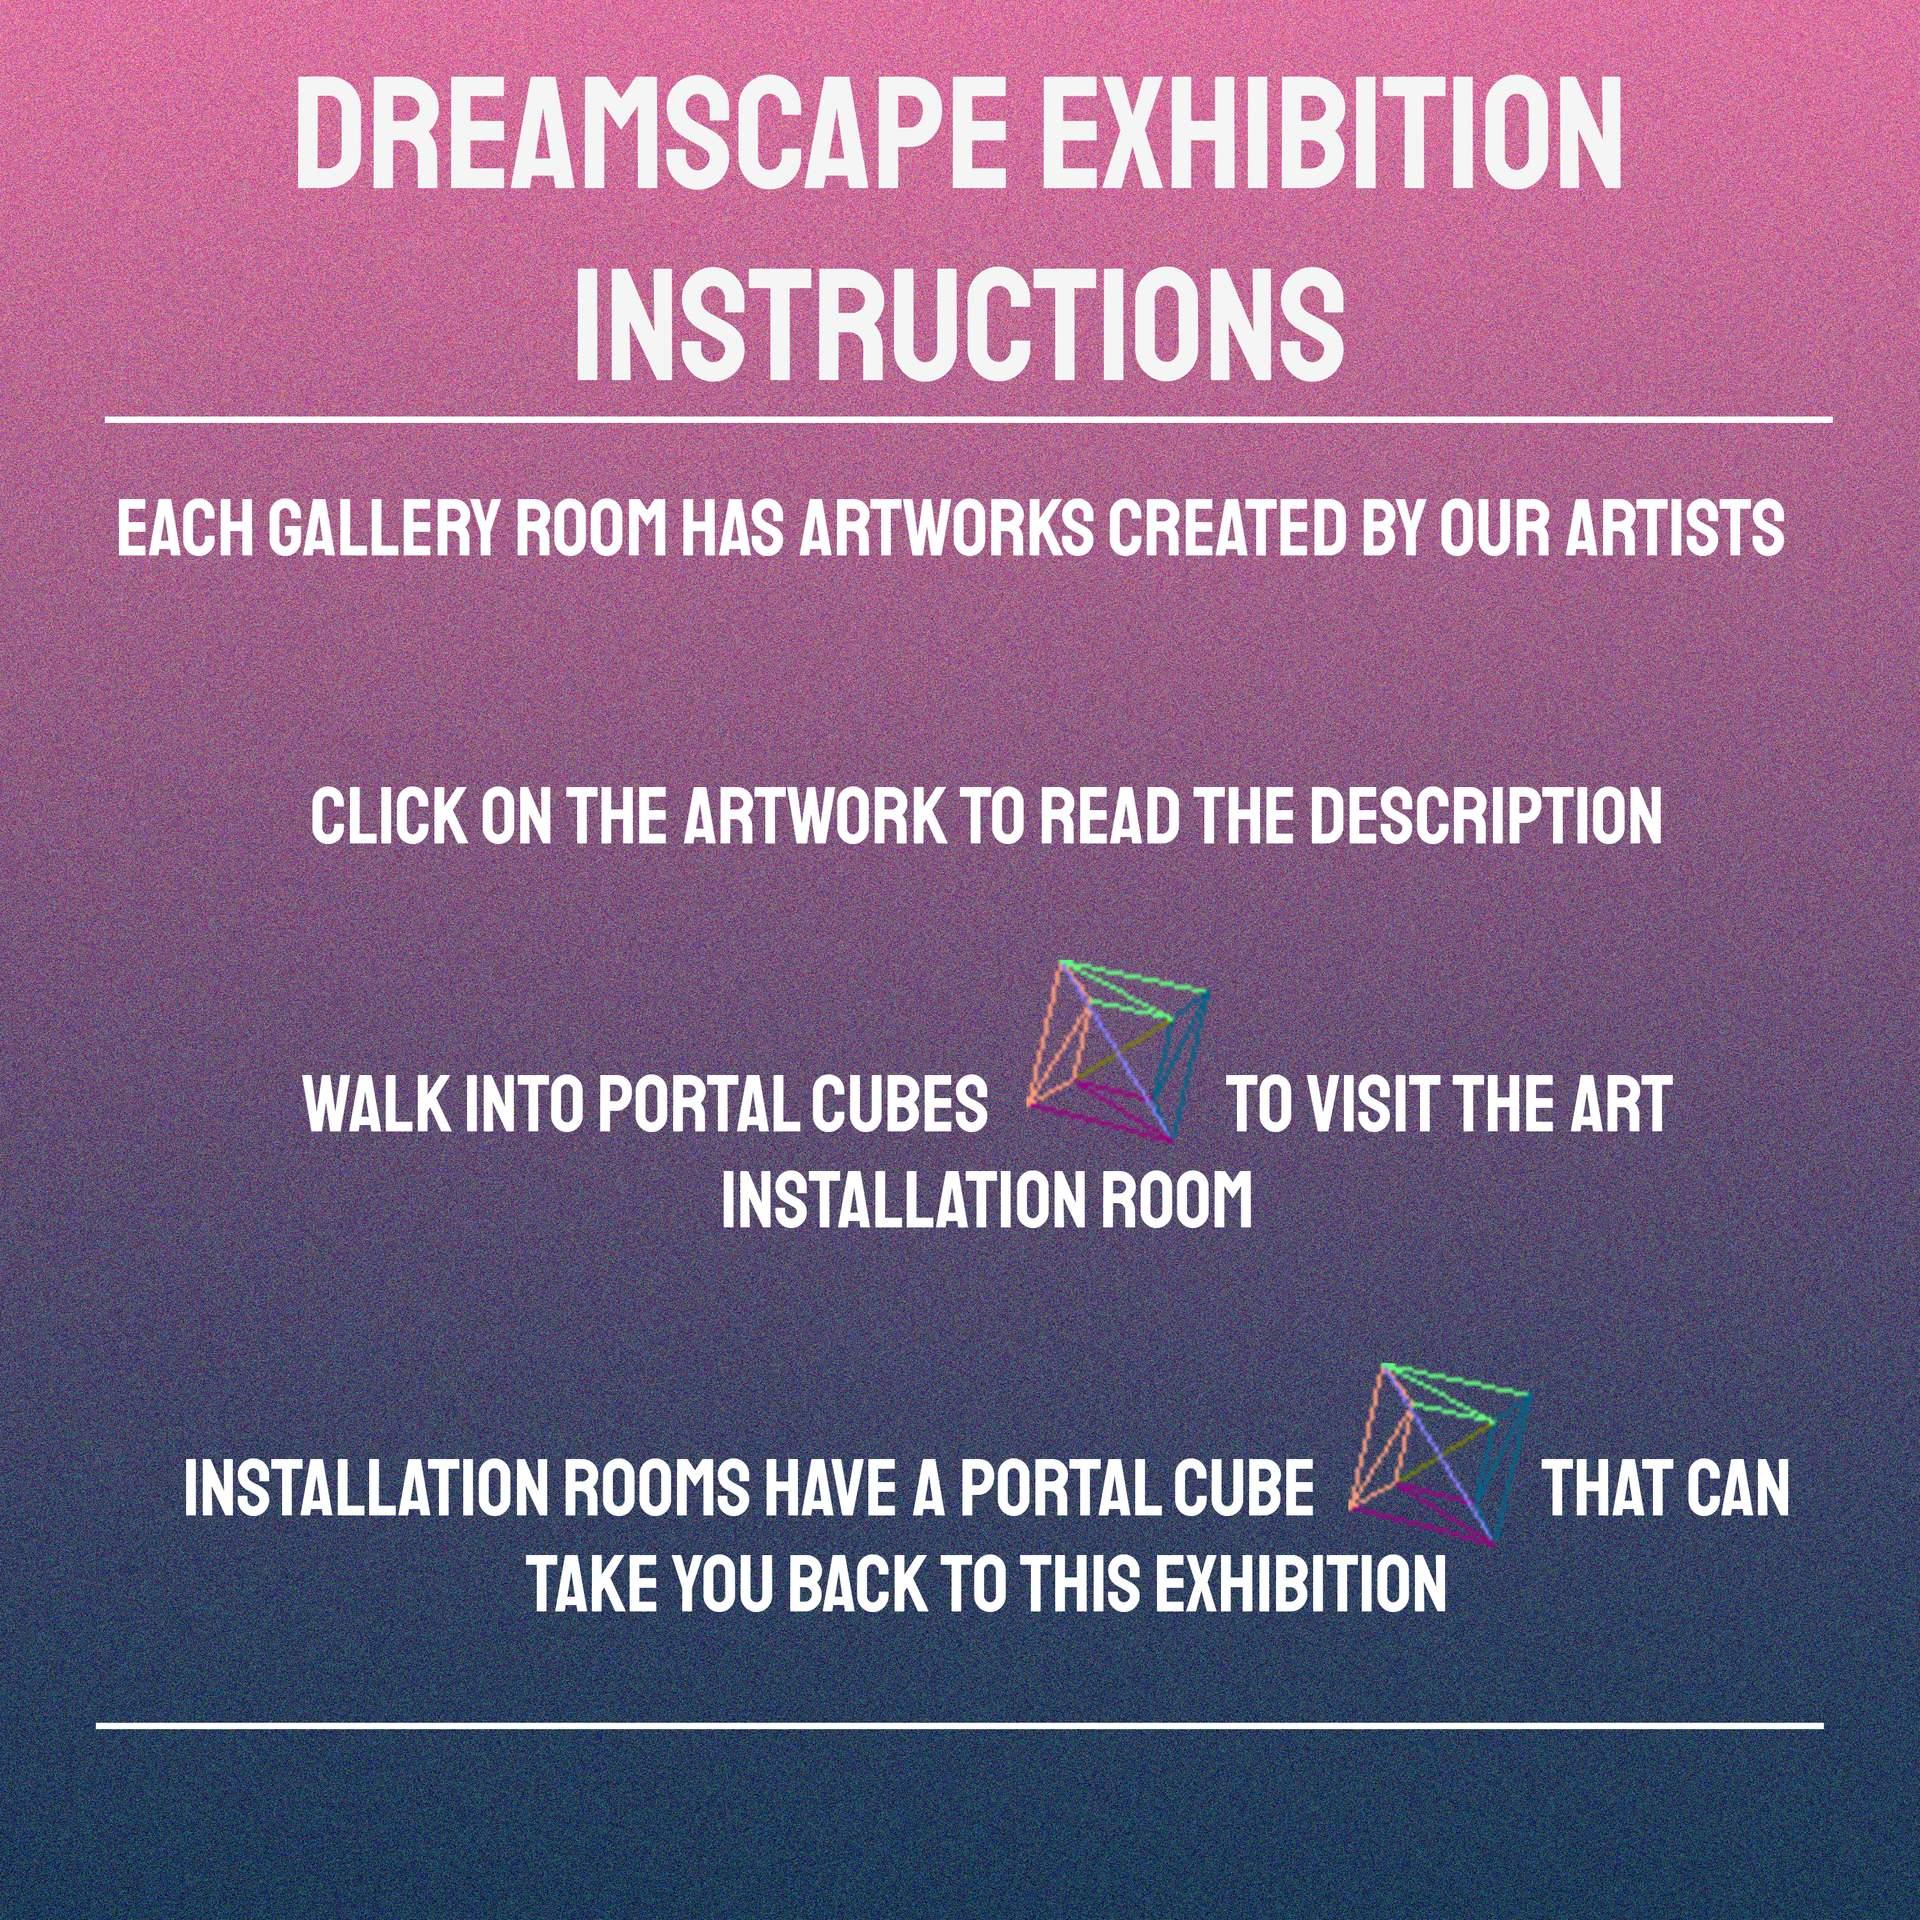 Dreamscape Exhibition Instructions